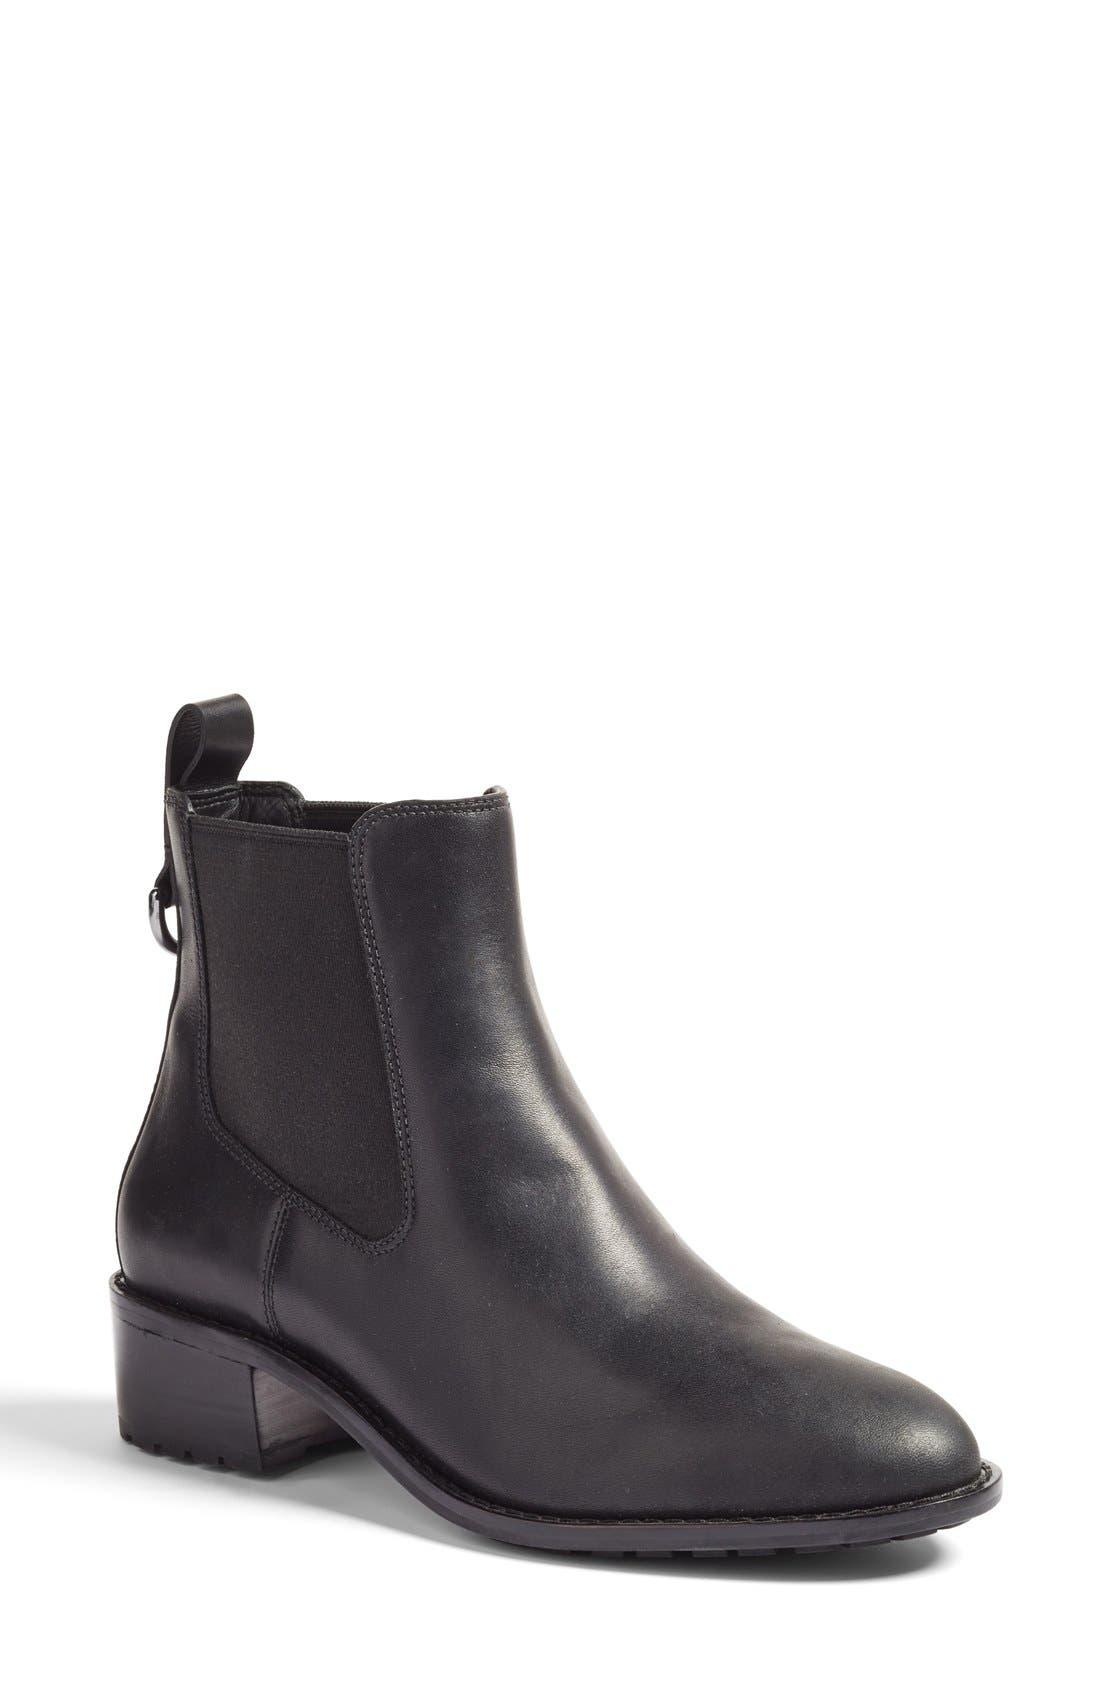 COLE HAAN Newburg Waterproof Chelsea Boot, Main, color, BLACK LEATHER